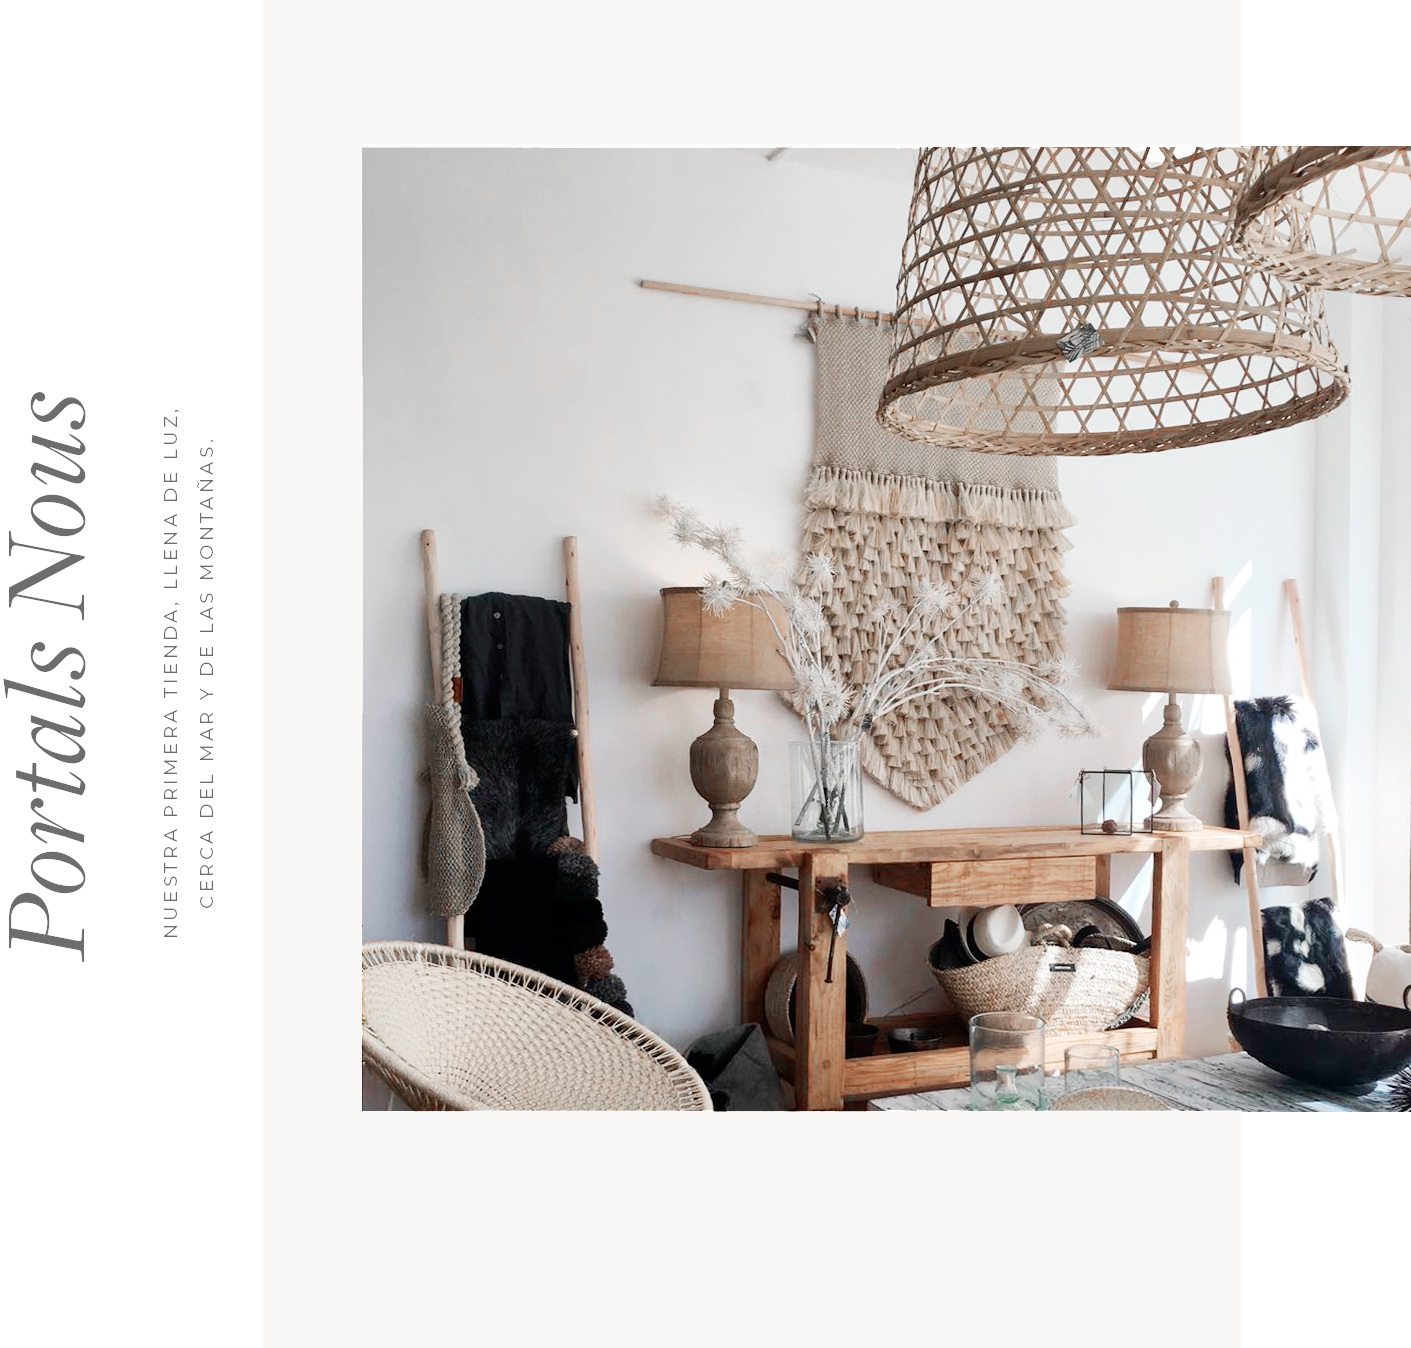 deguayhaus_conceptstore_portals_001.png